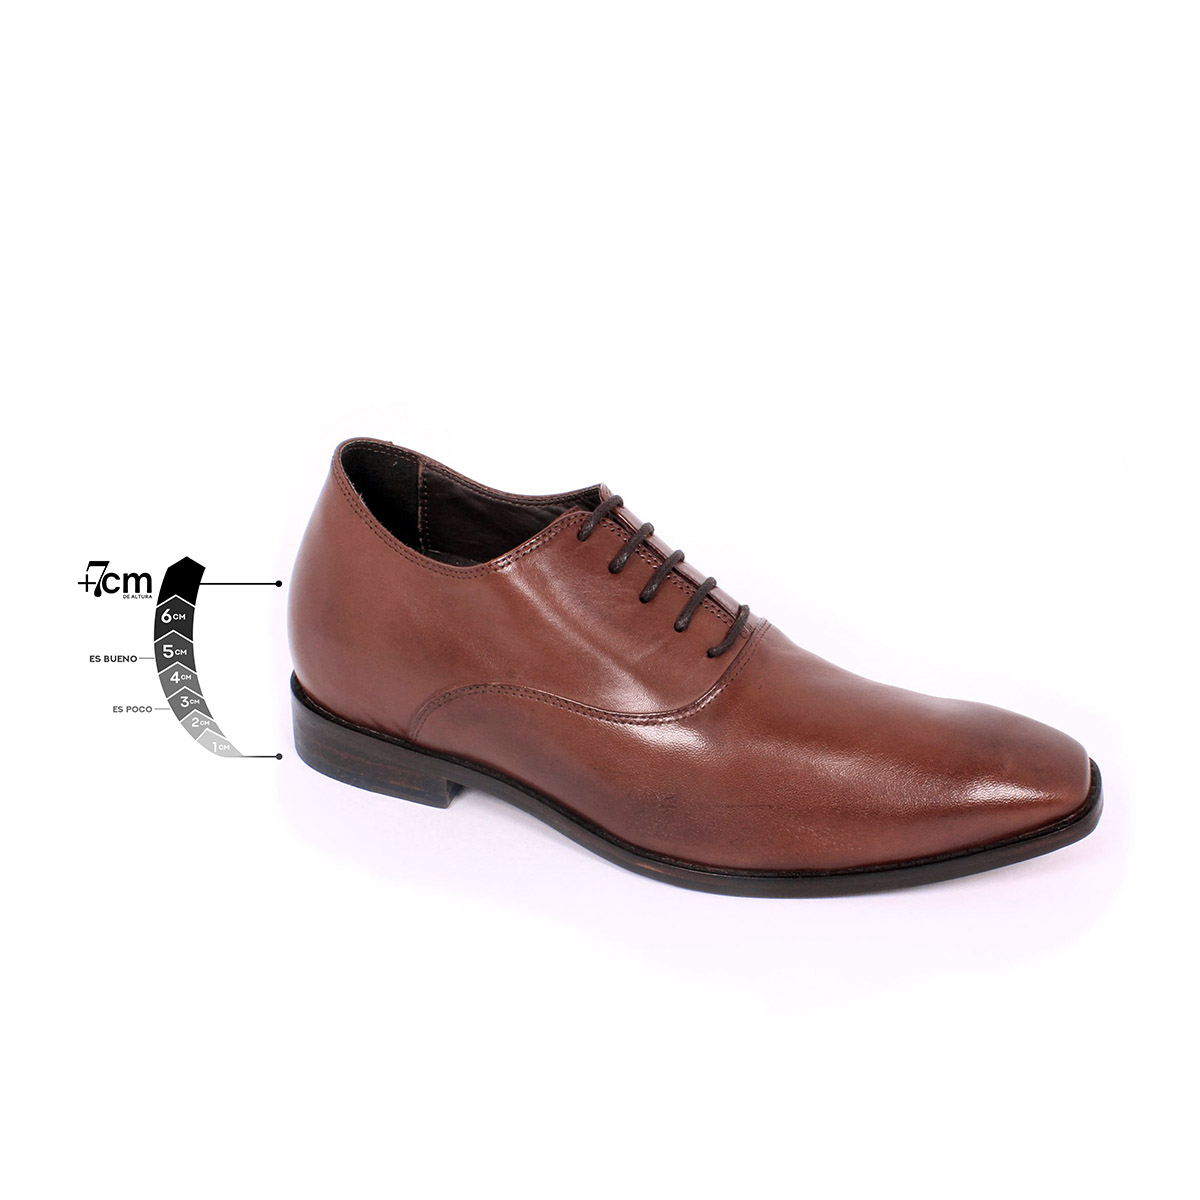 Zapato Formal Elegant Café Max Denegri +7cms de Altura_75306